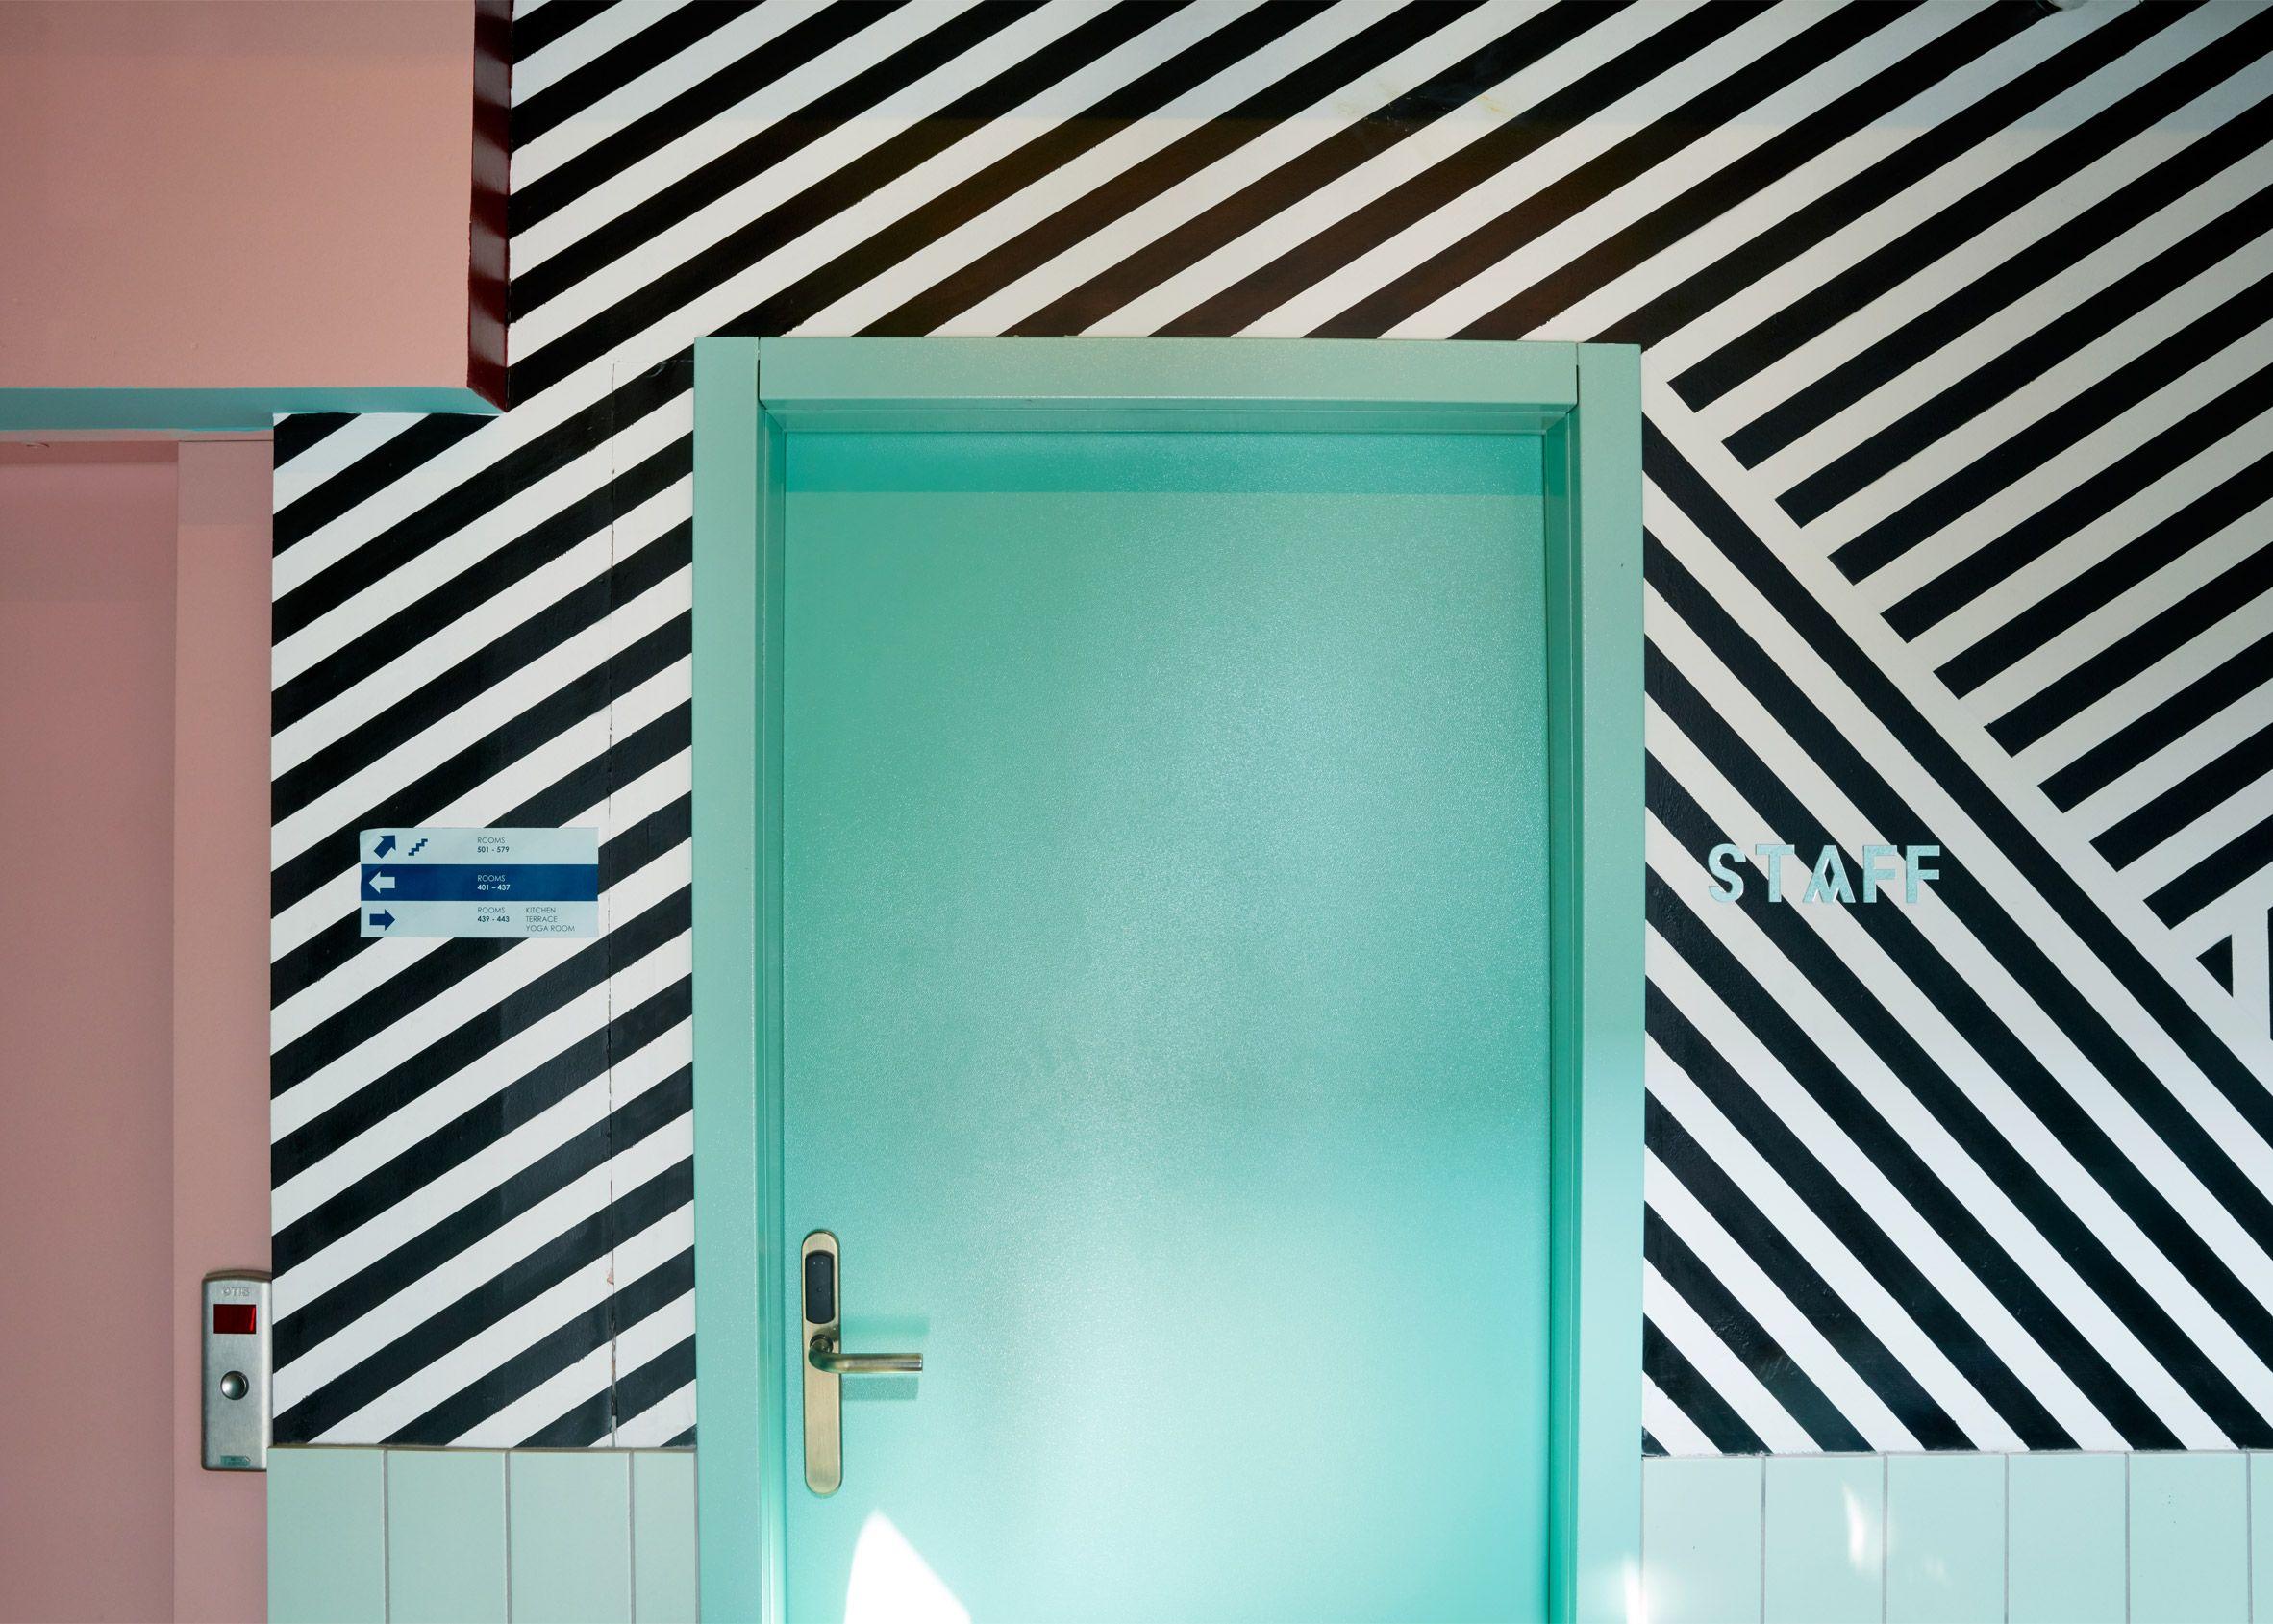 Döðlur converts Reykjavík warehouse into a design hotel and hostel ...